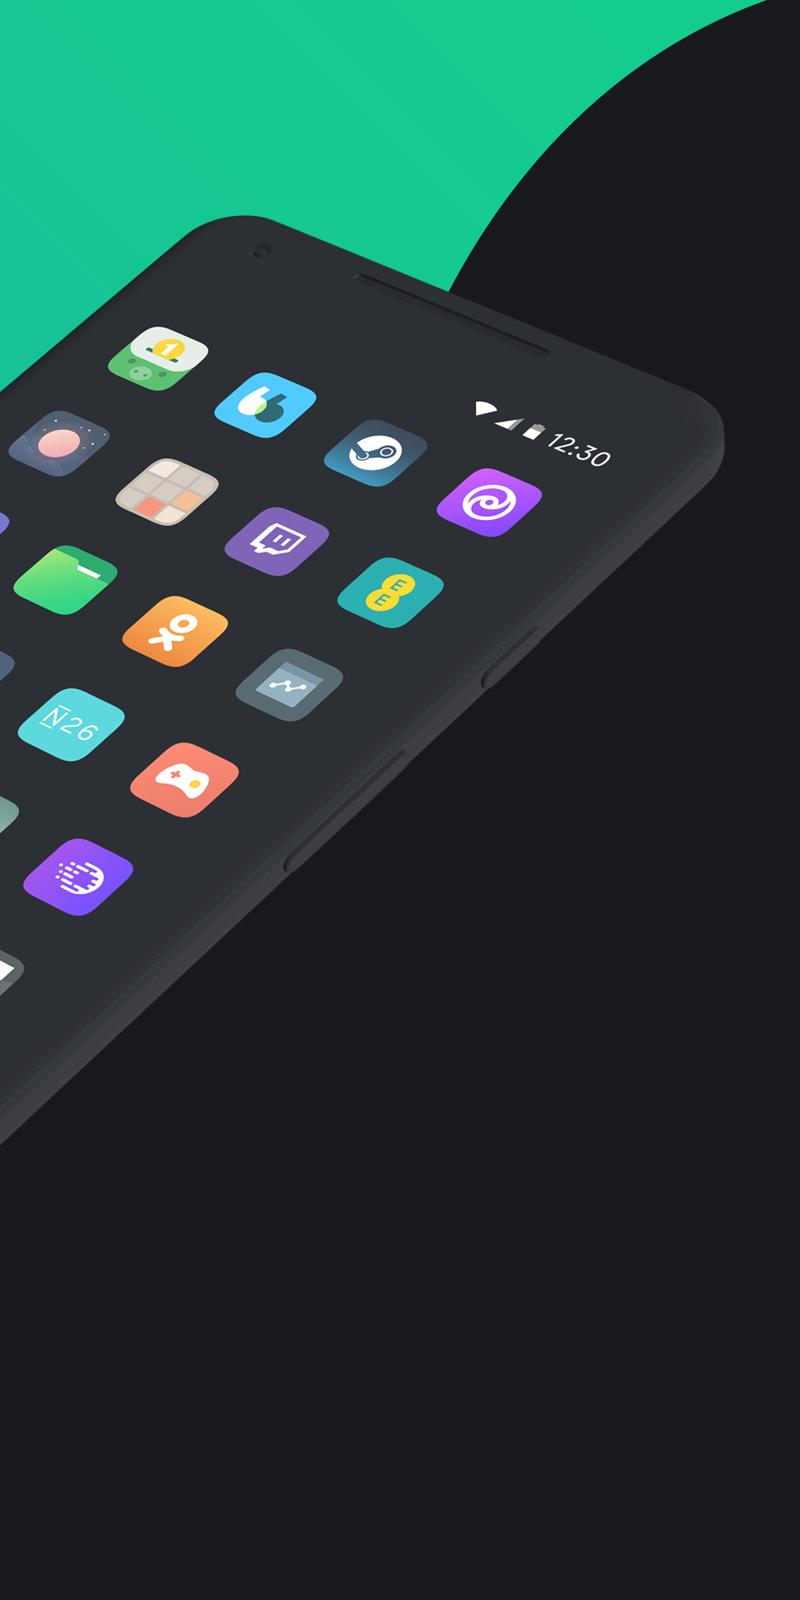 Borealis - Icon Pack Screenshot 3